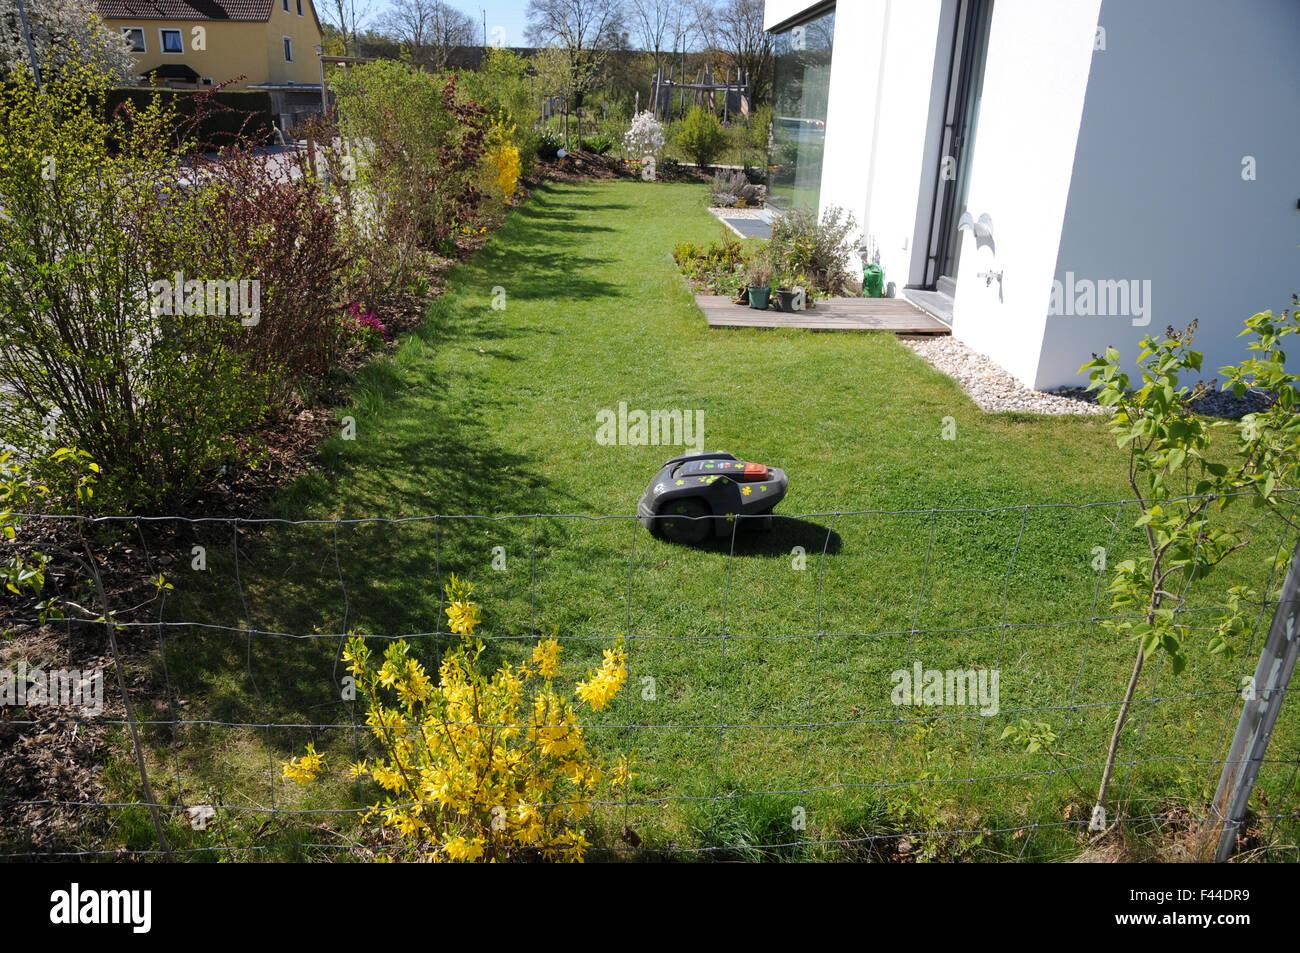 Robotic lawn mower - Stock Image